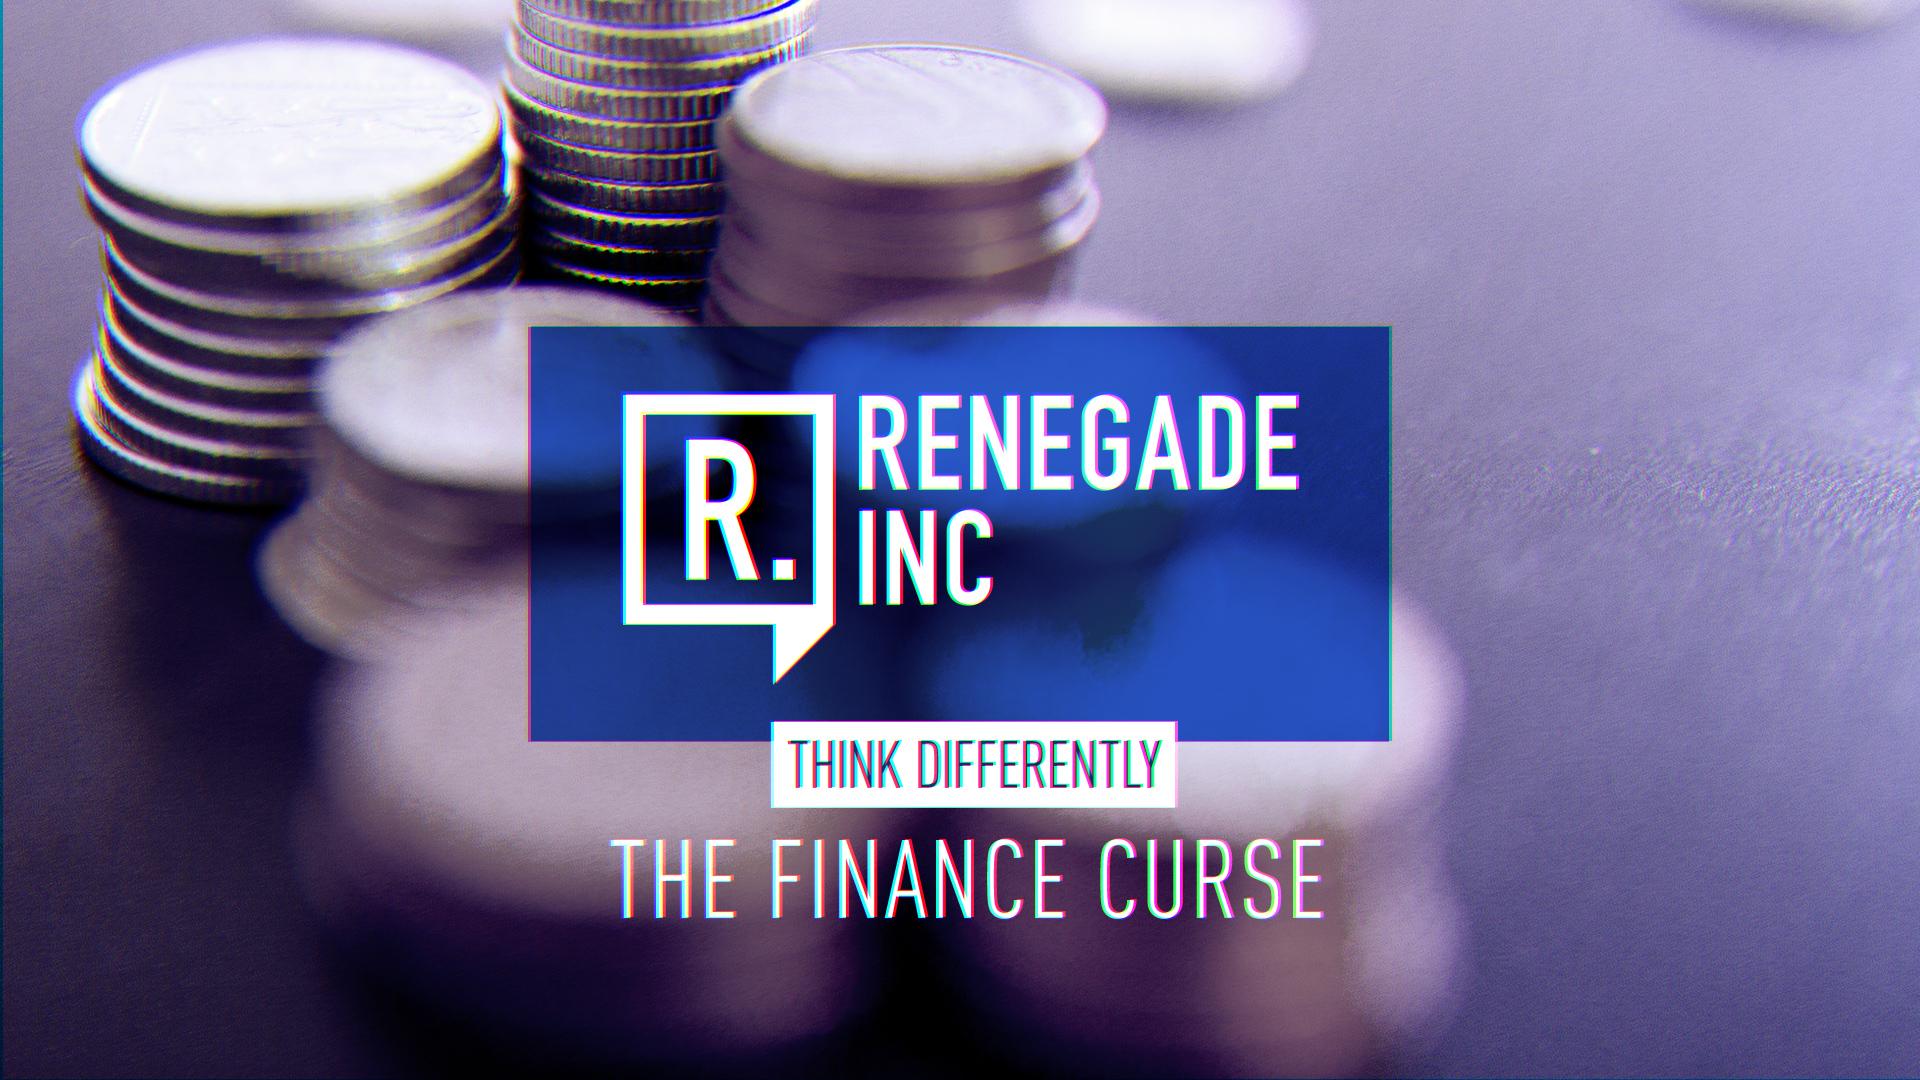 RenegadeInc_RT_EP03